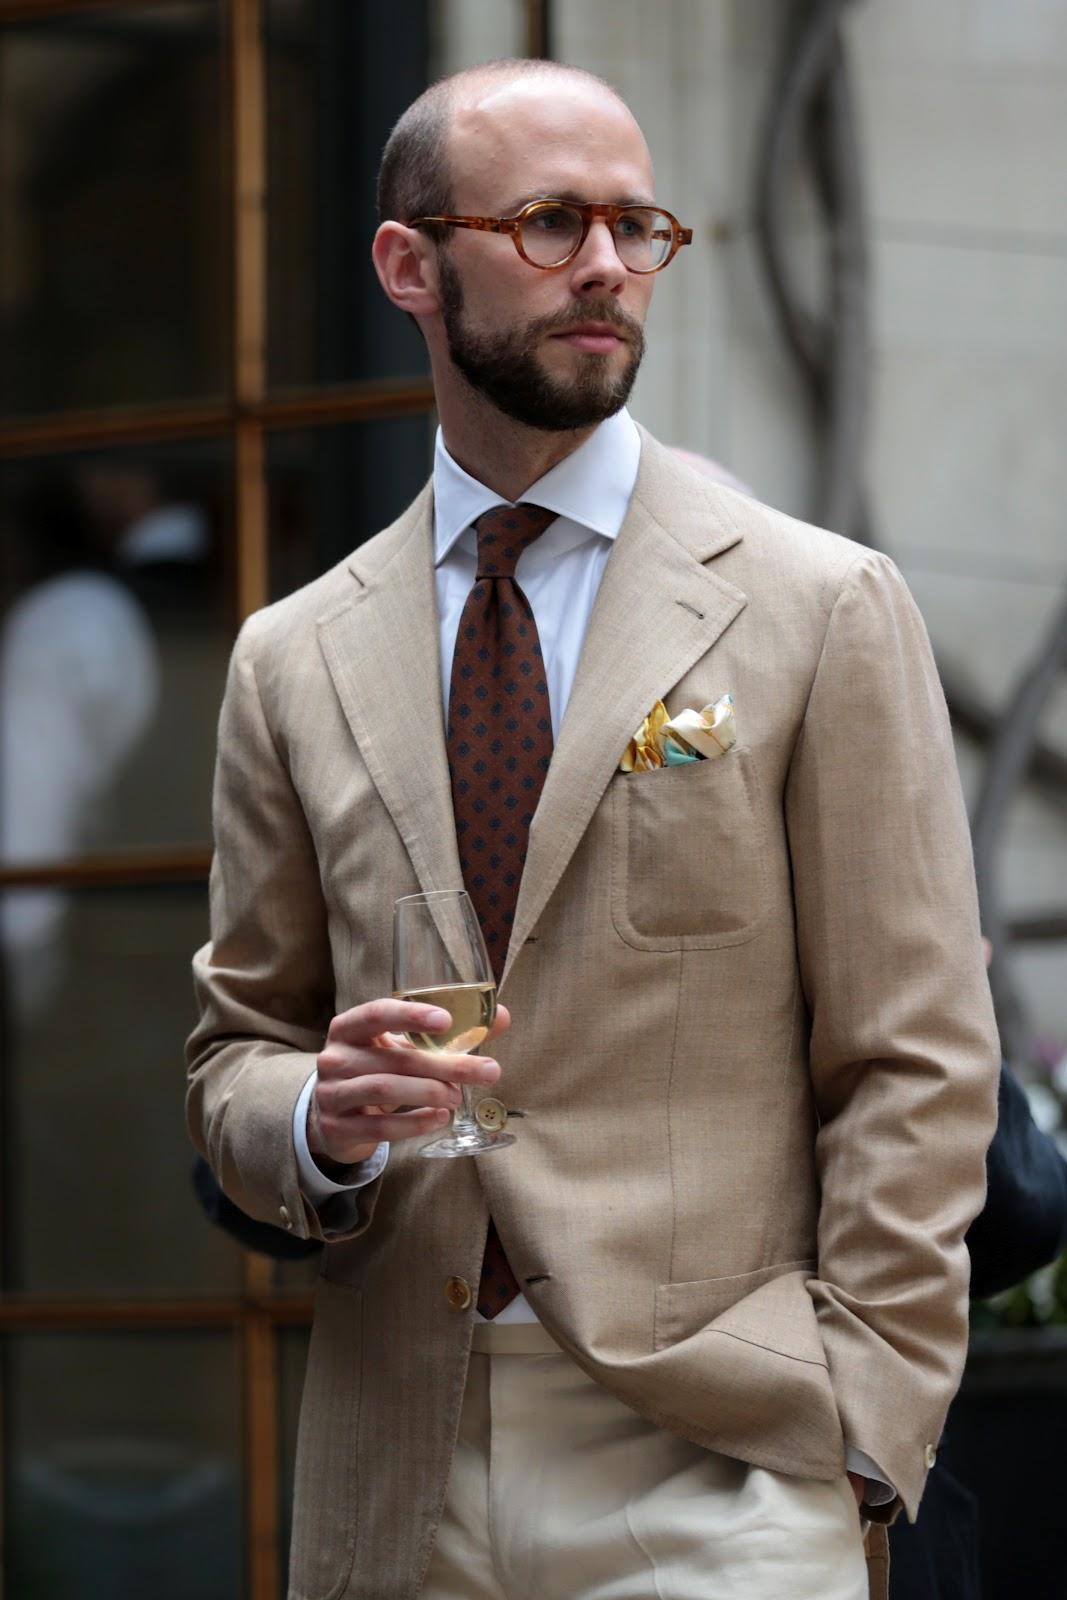 Elia Caliendo jacket – Permanent Style